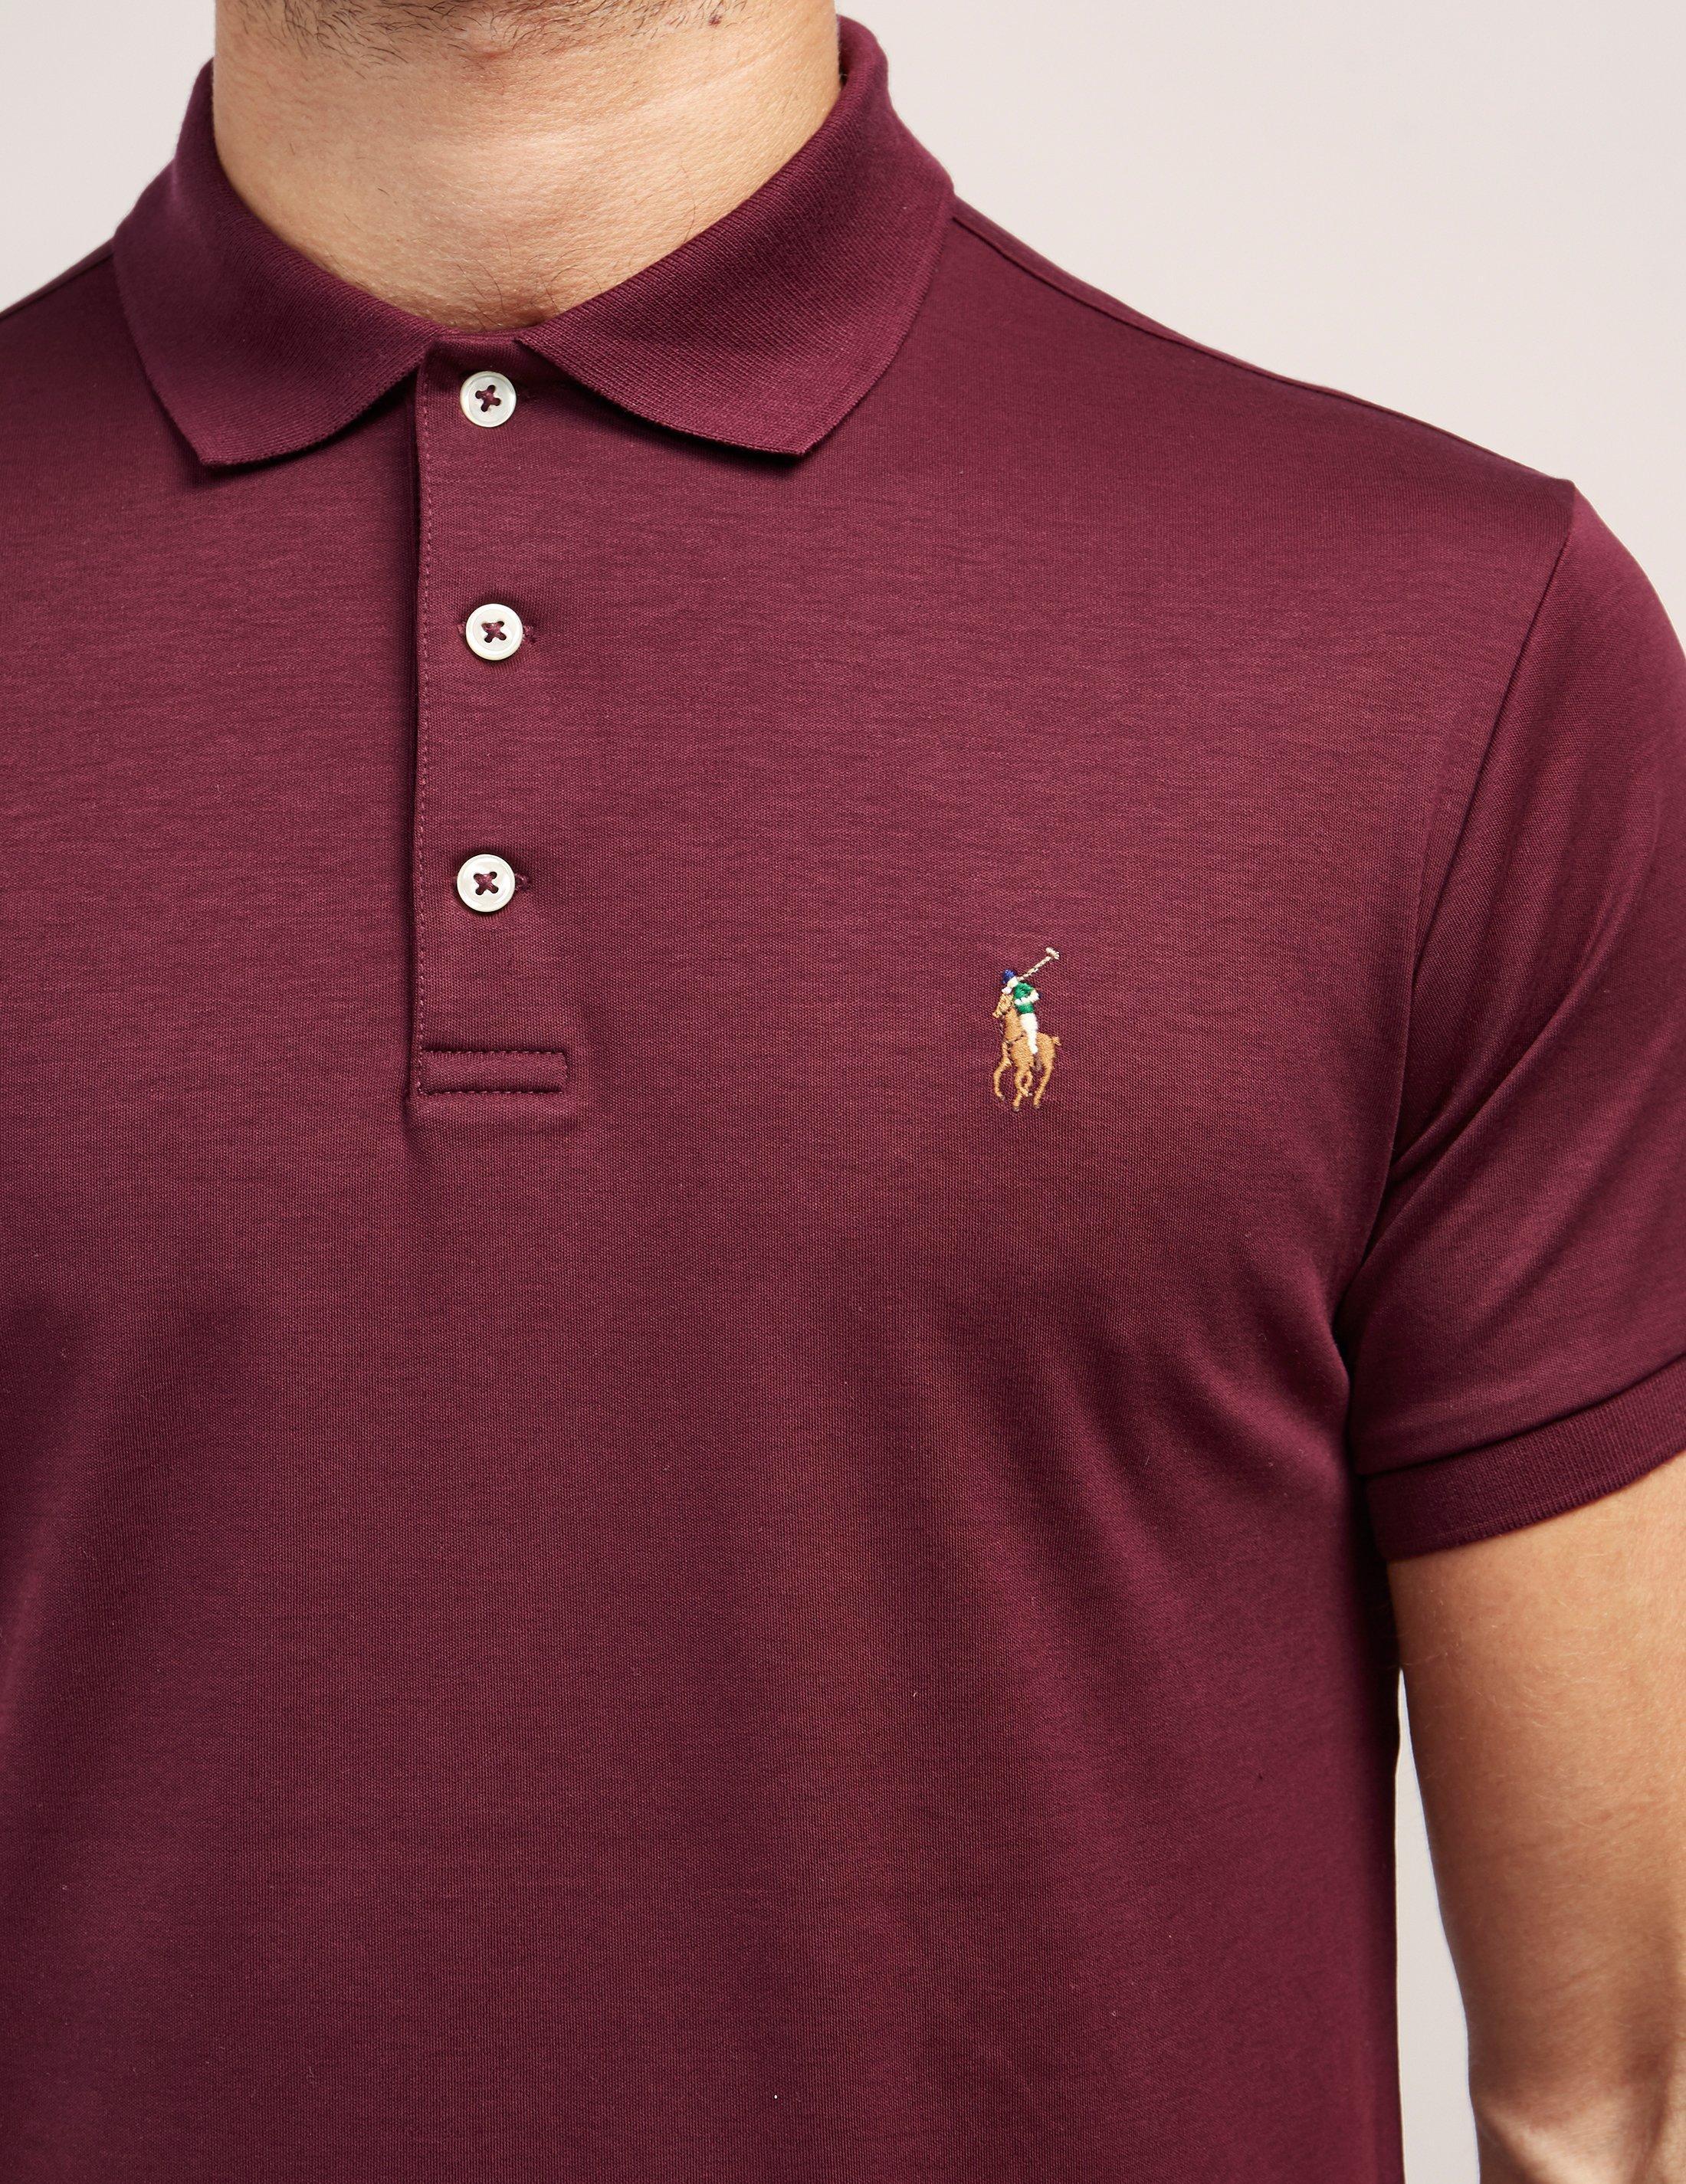 2359aca6 Polo Ralph Lauren Mens Slim Short Sleeve Polo Shirt Burgundy in ...